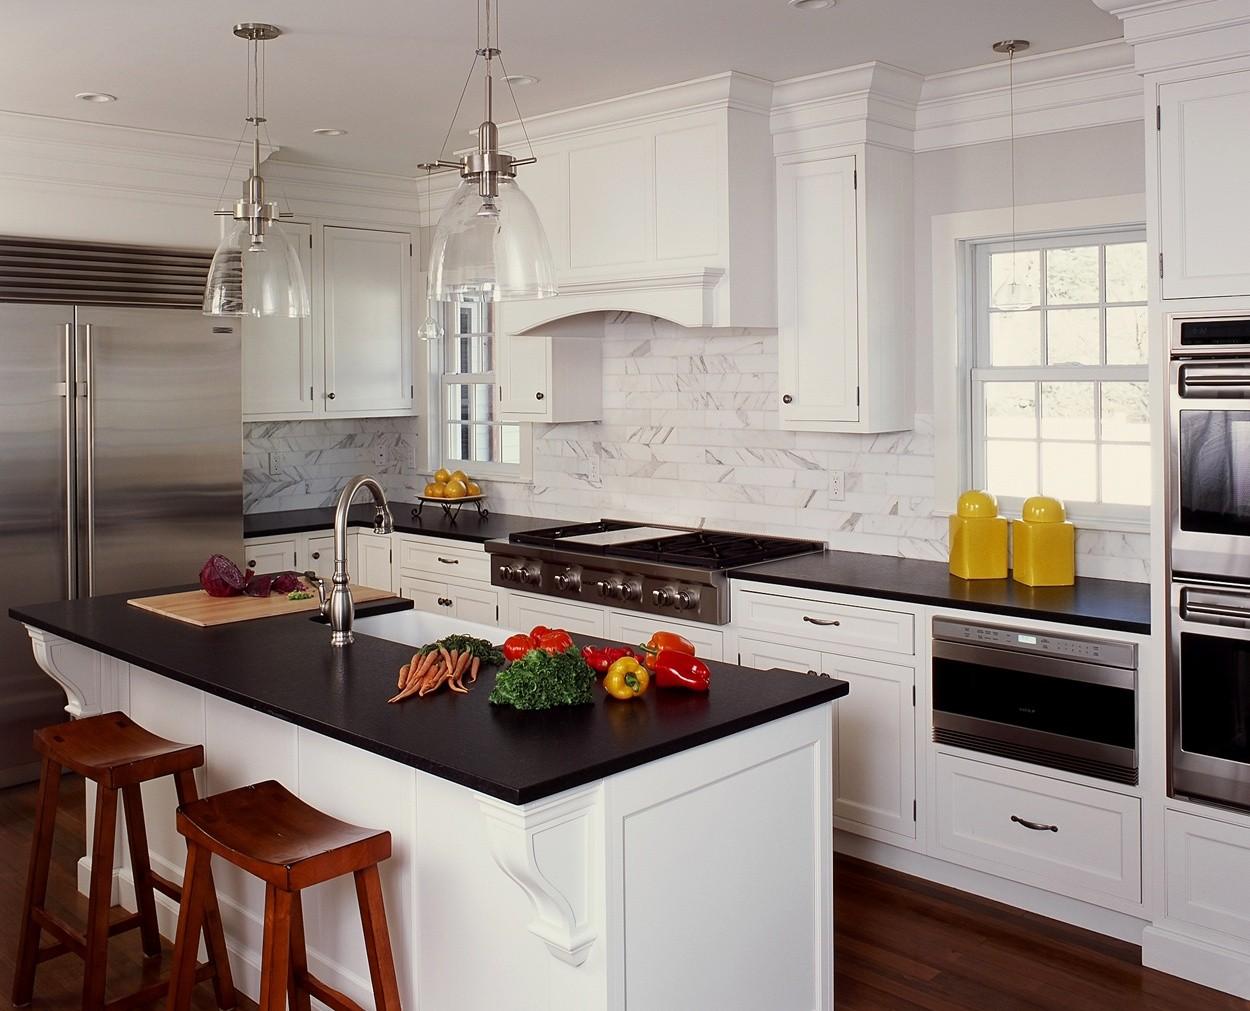 Clark Construction's Chrysalis award winning kitchen in New Canaan CT